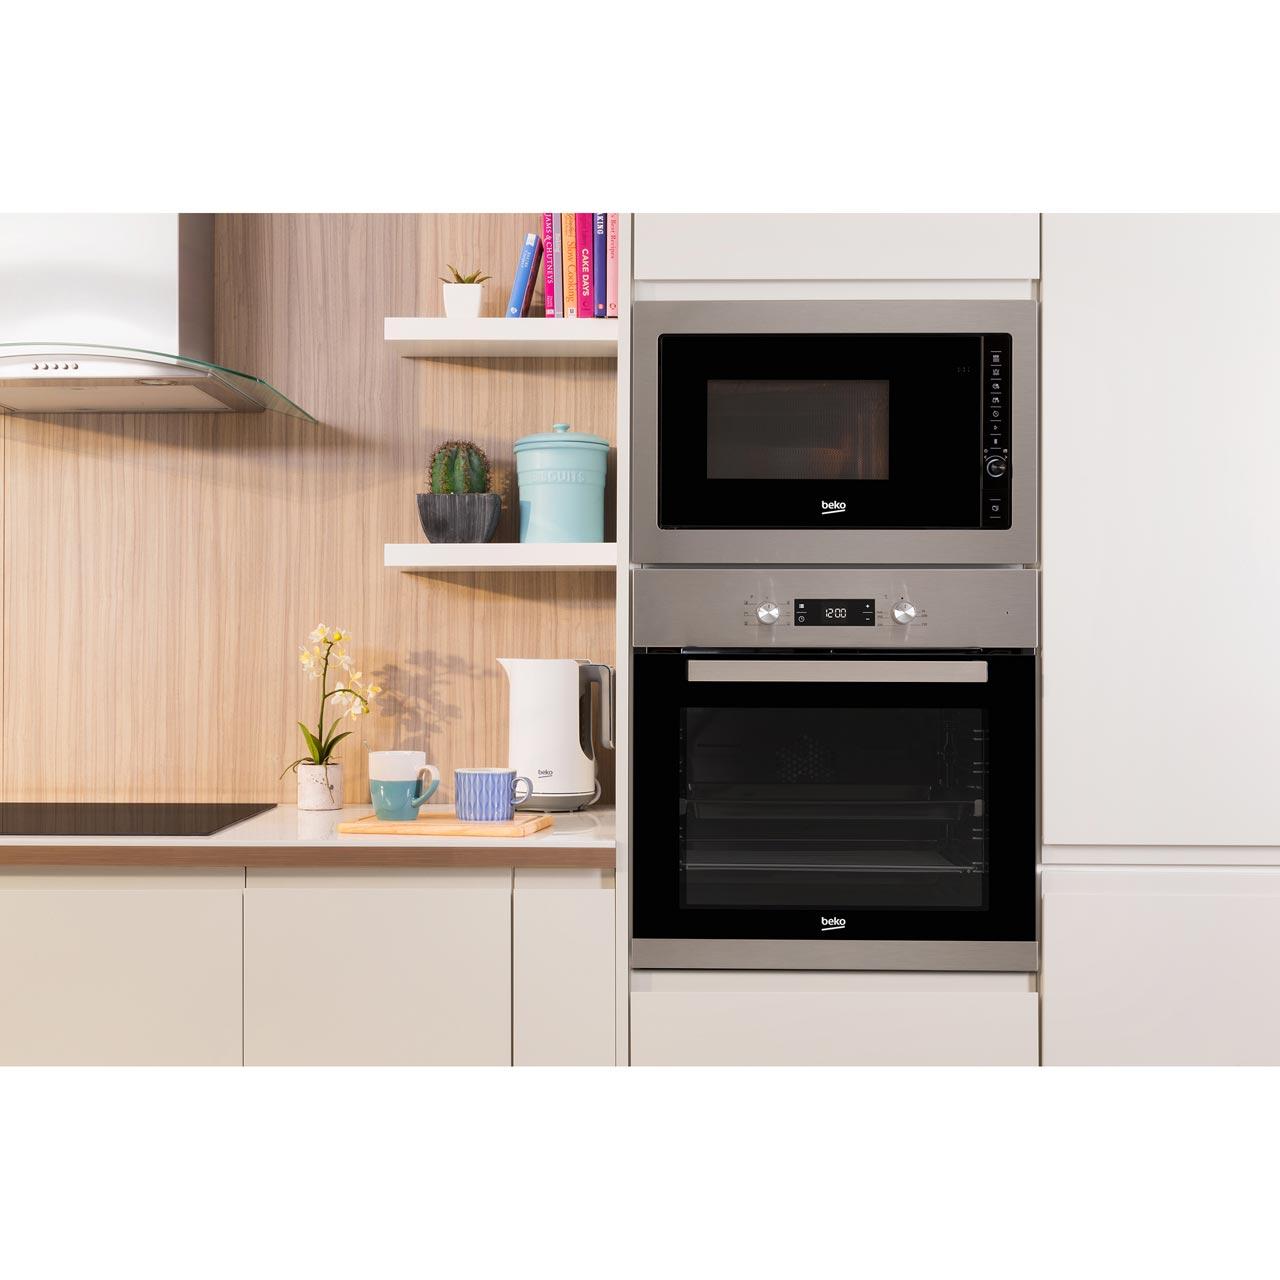 Beko MGB25332BG Integrated Microwave